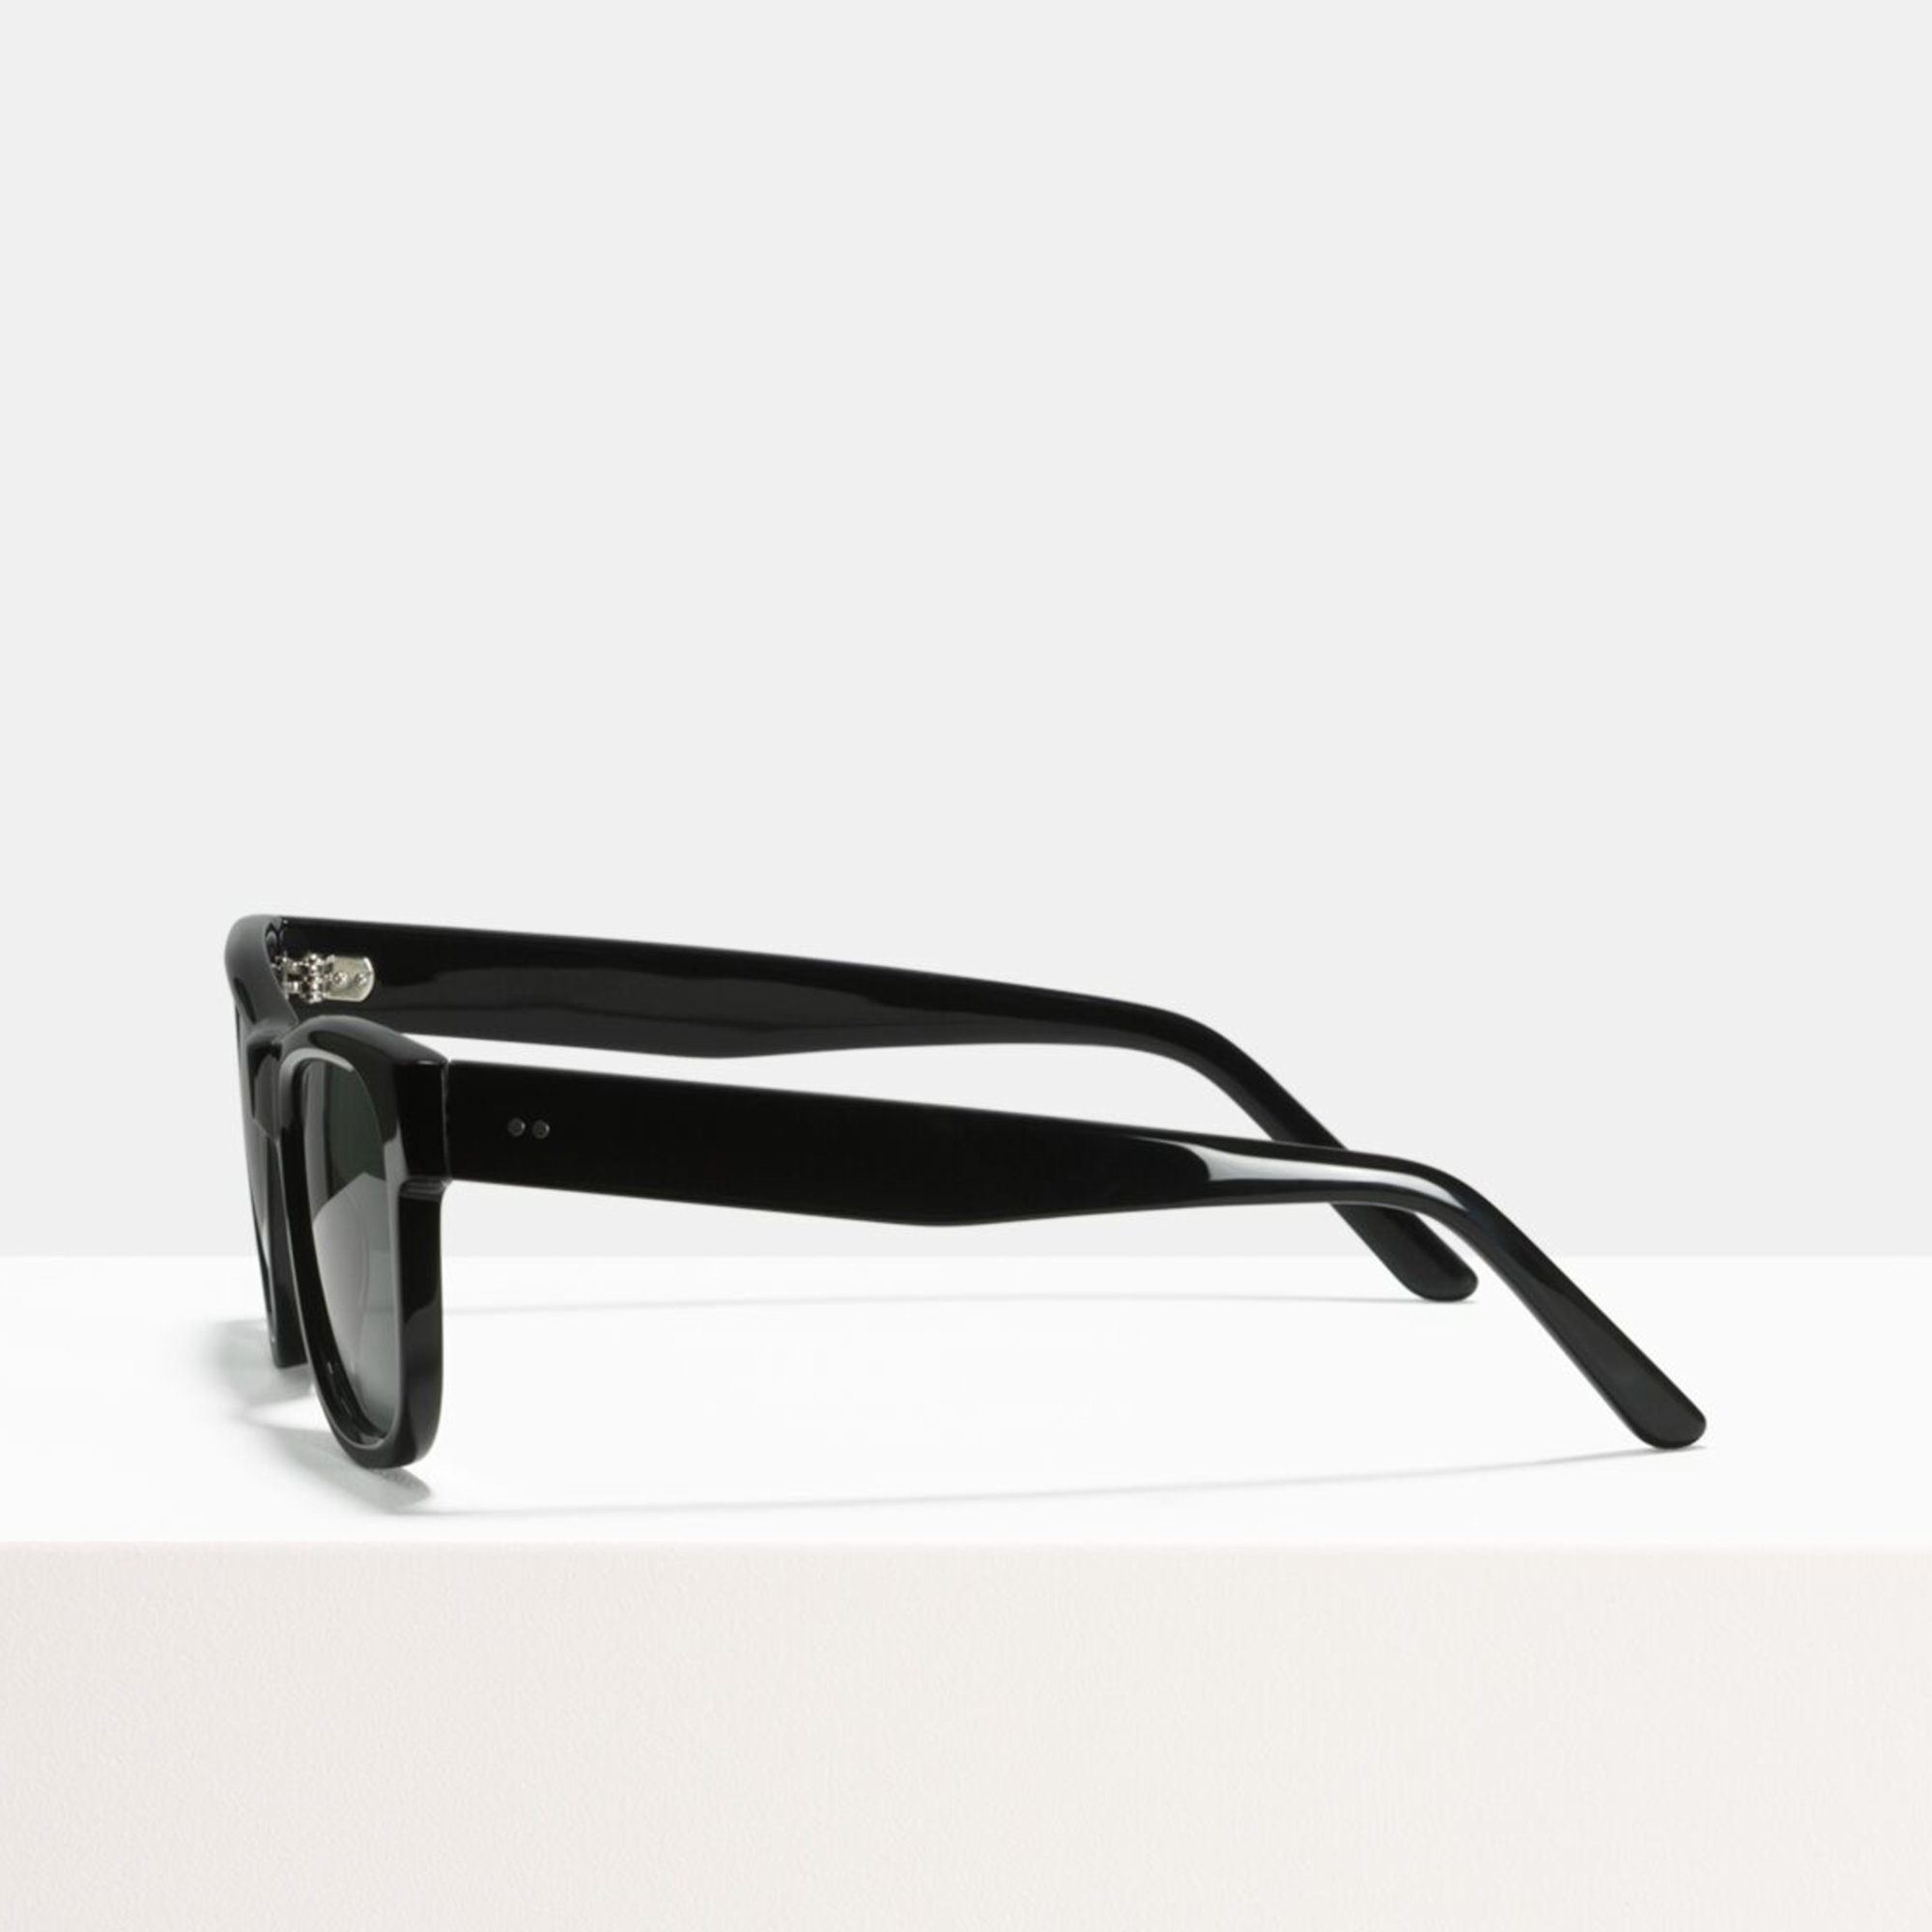 Ace & Tate Sunglasses | rechteckig Acetat in Schwarz